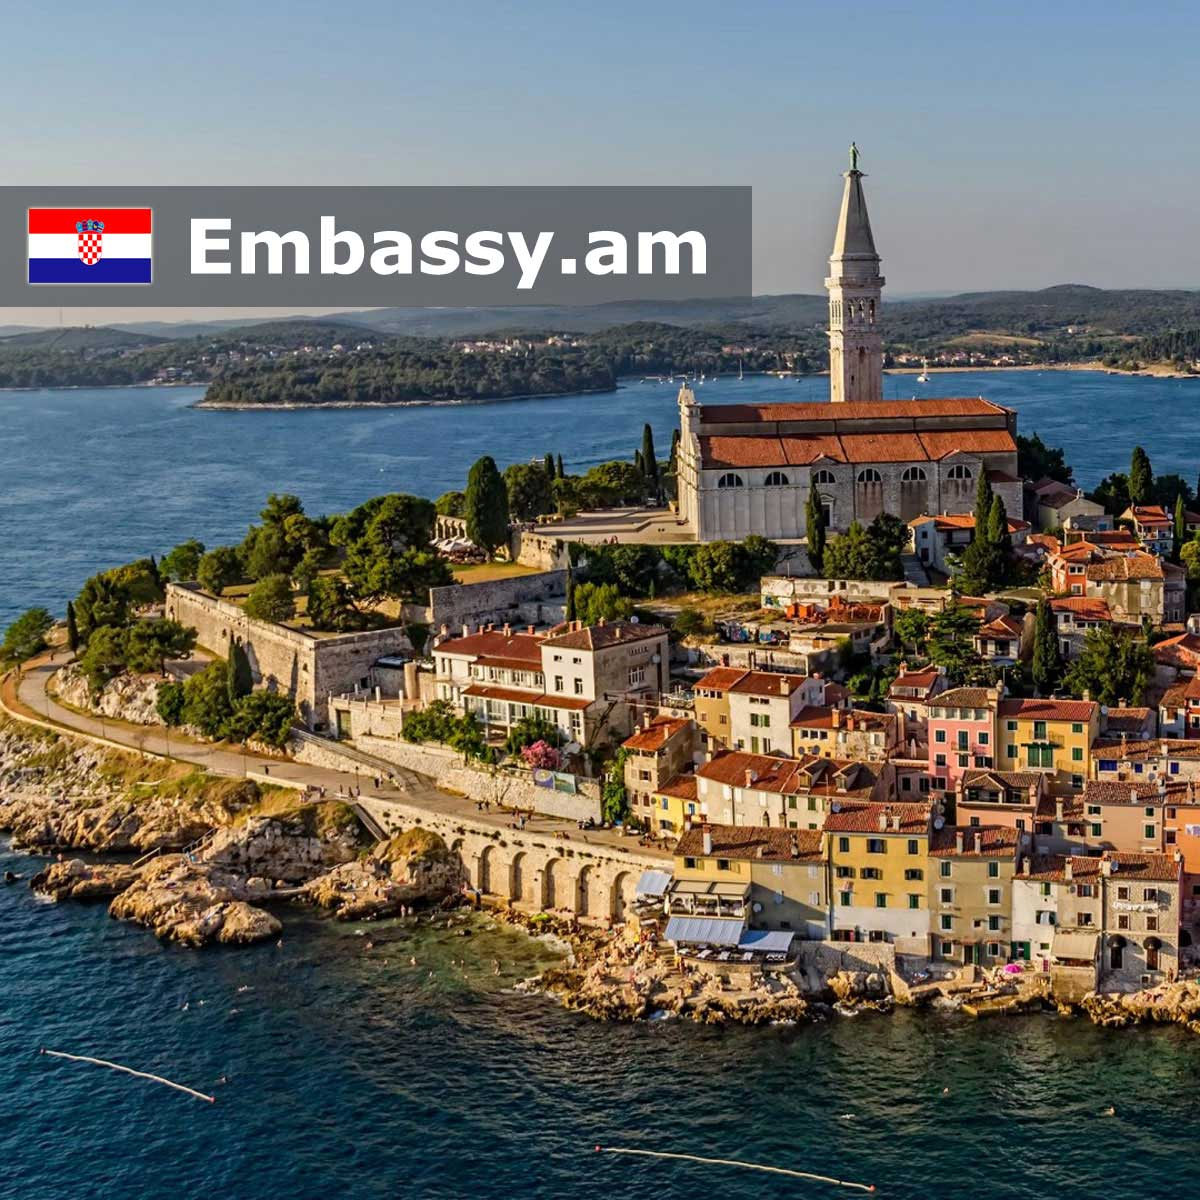 Rovinj - Hotels in Croatia - Embassy.am